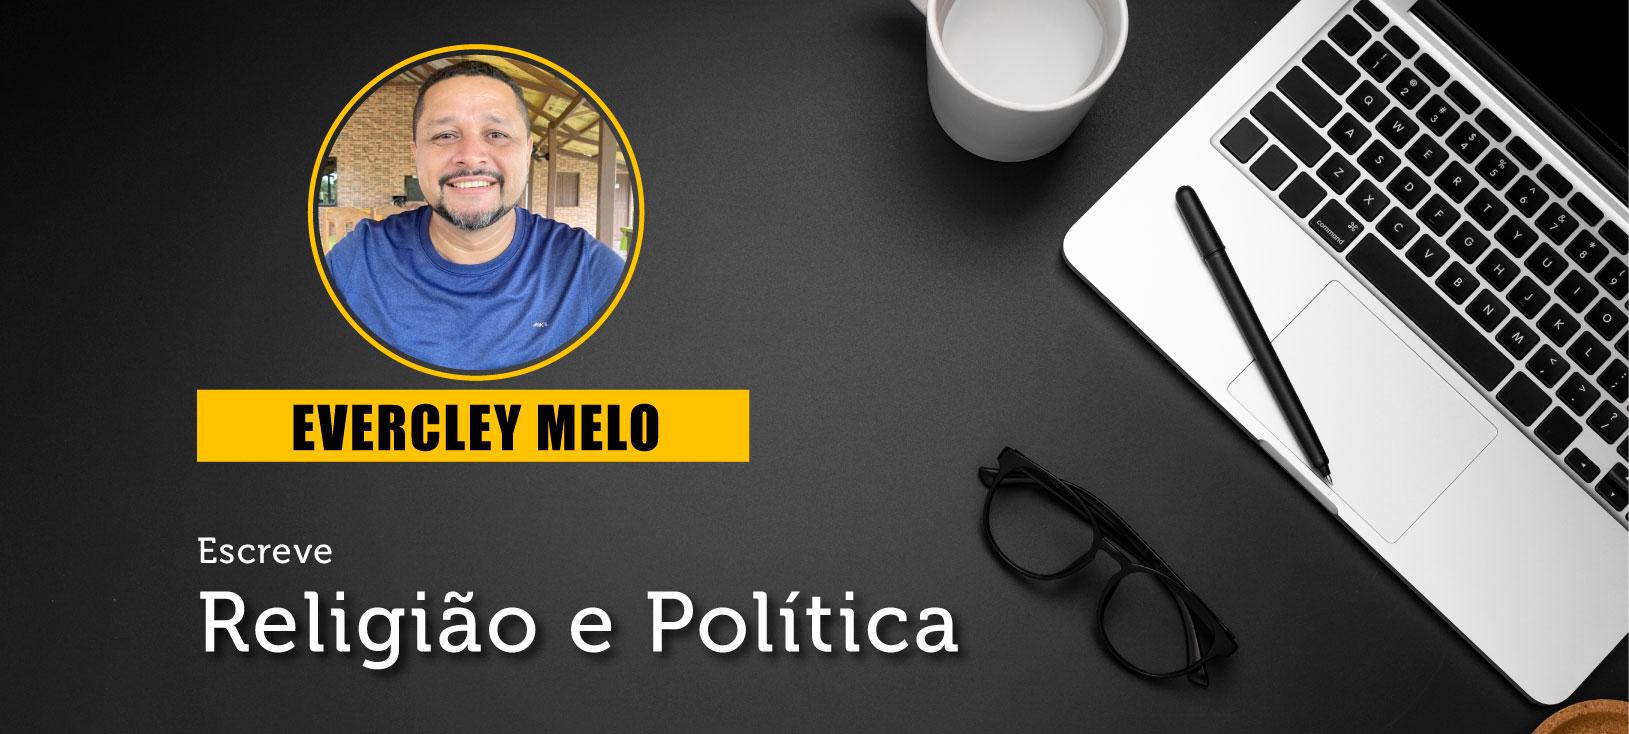 evercley-melo